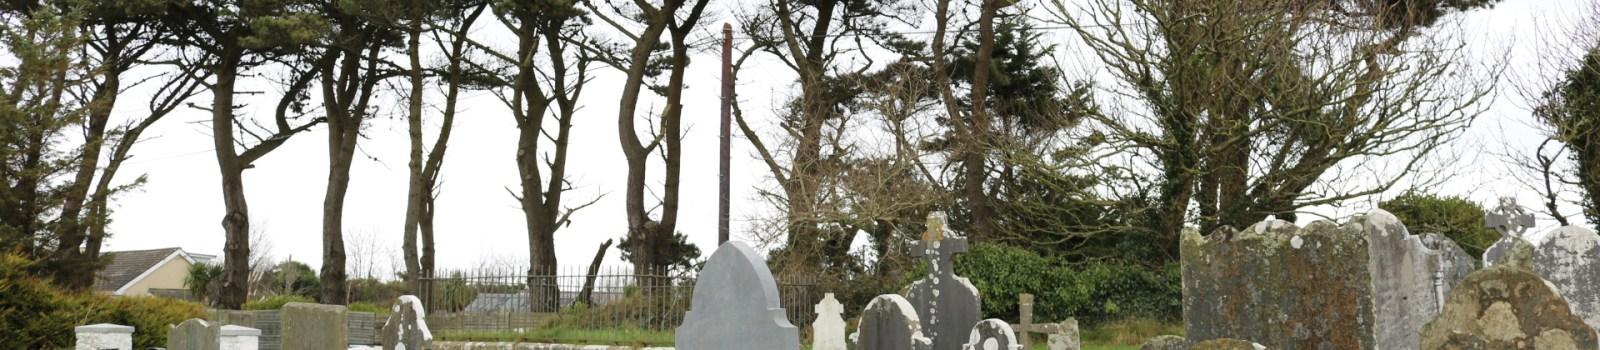 Donaghmore Cemetery, Cahore